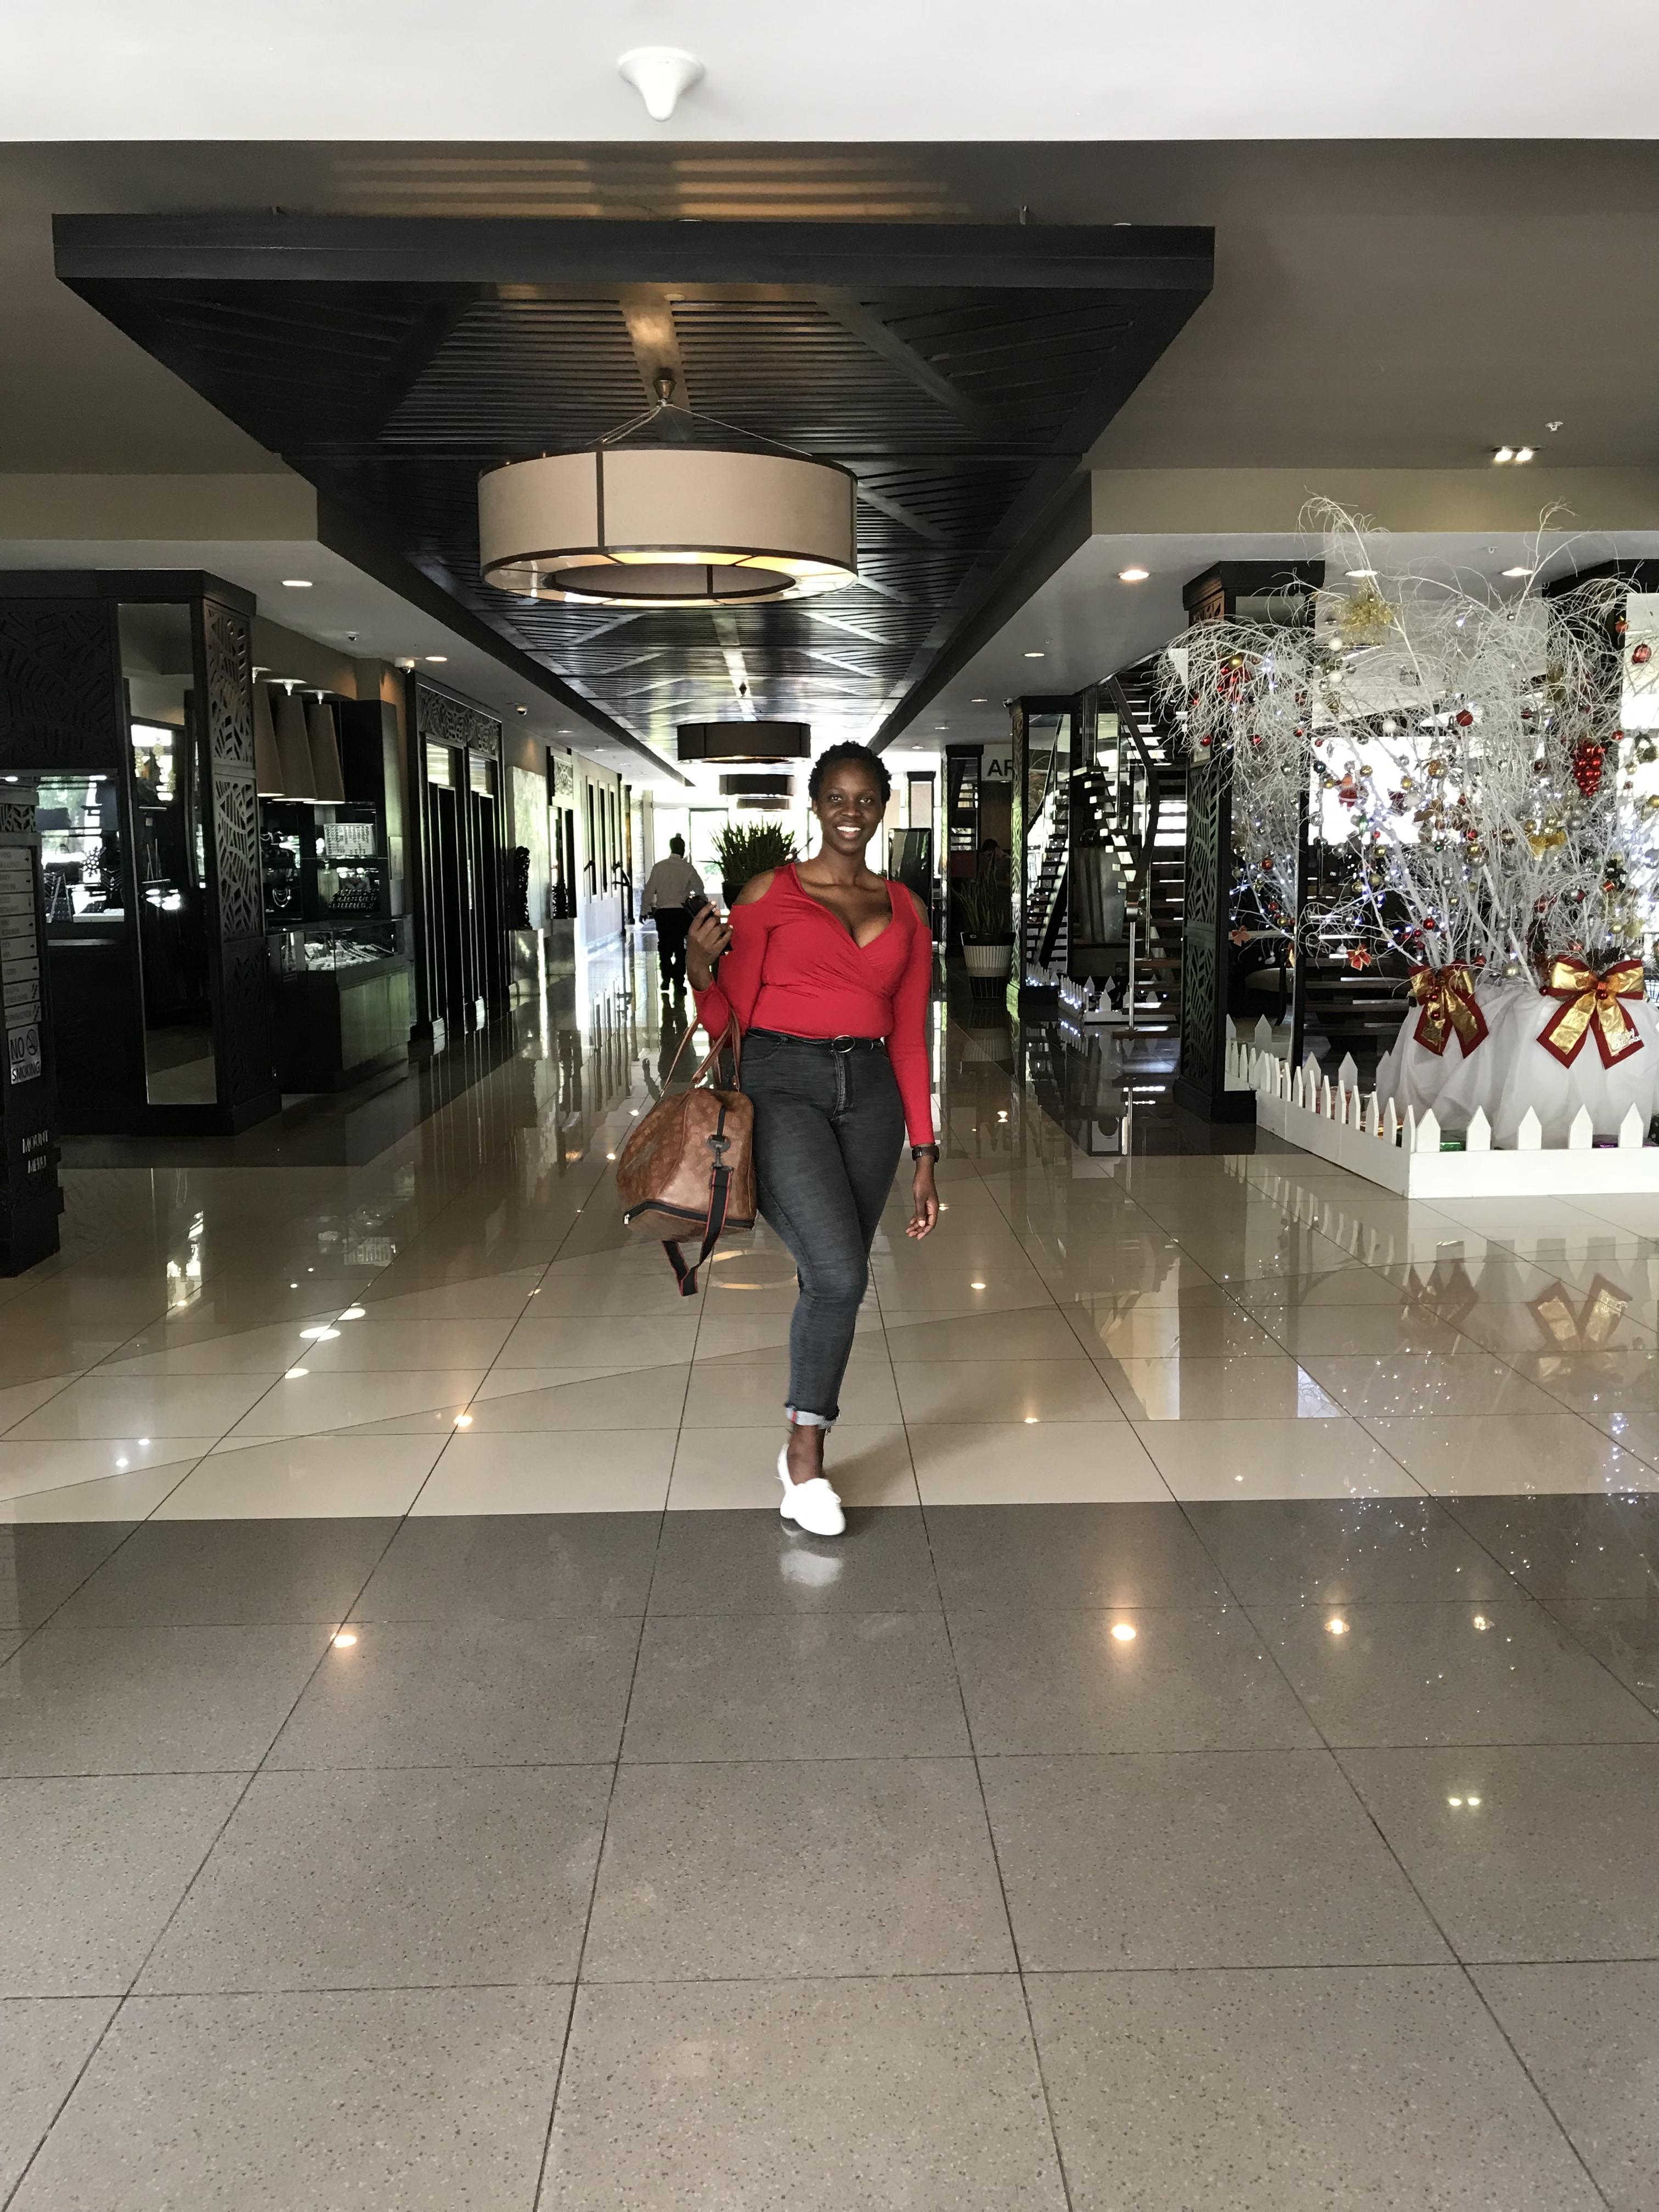 My Trip to Arusha